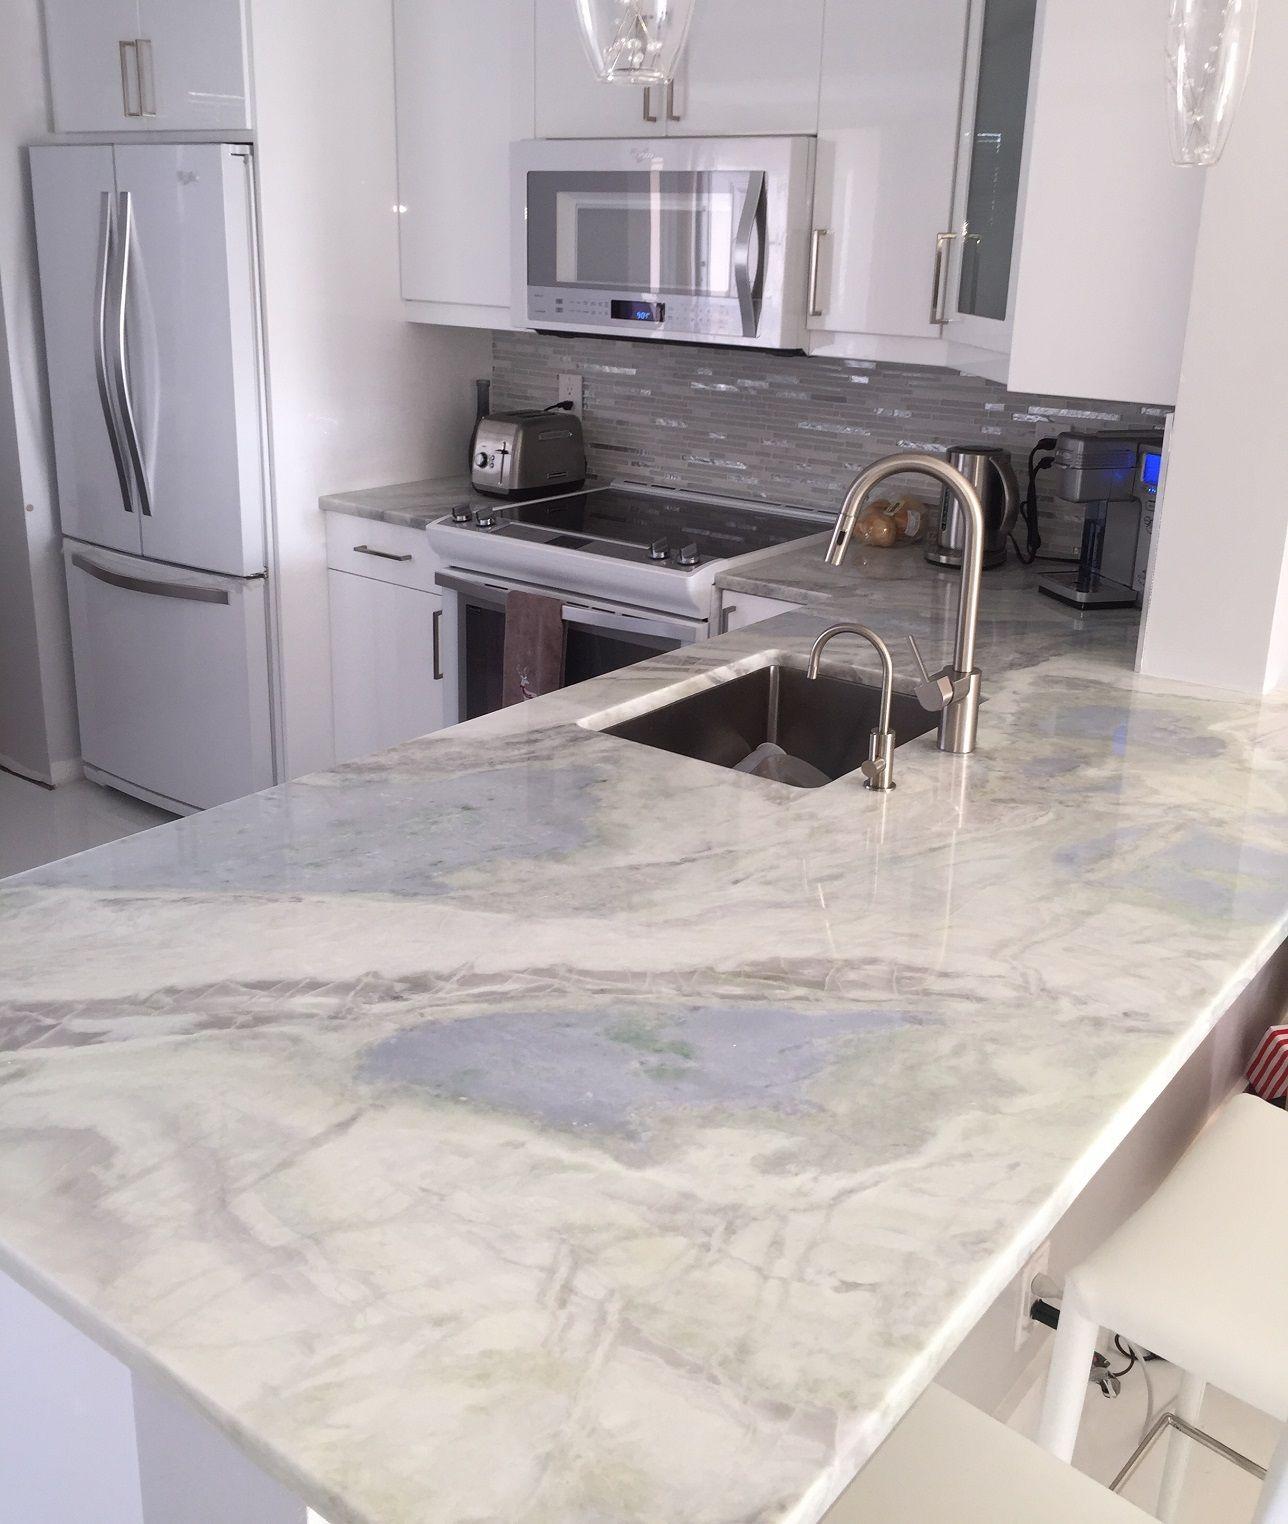 Lumen Quartzite Countertops Kitchen in Hallandale Beach